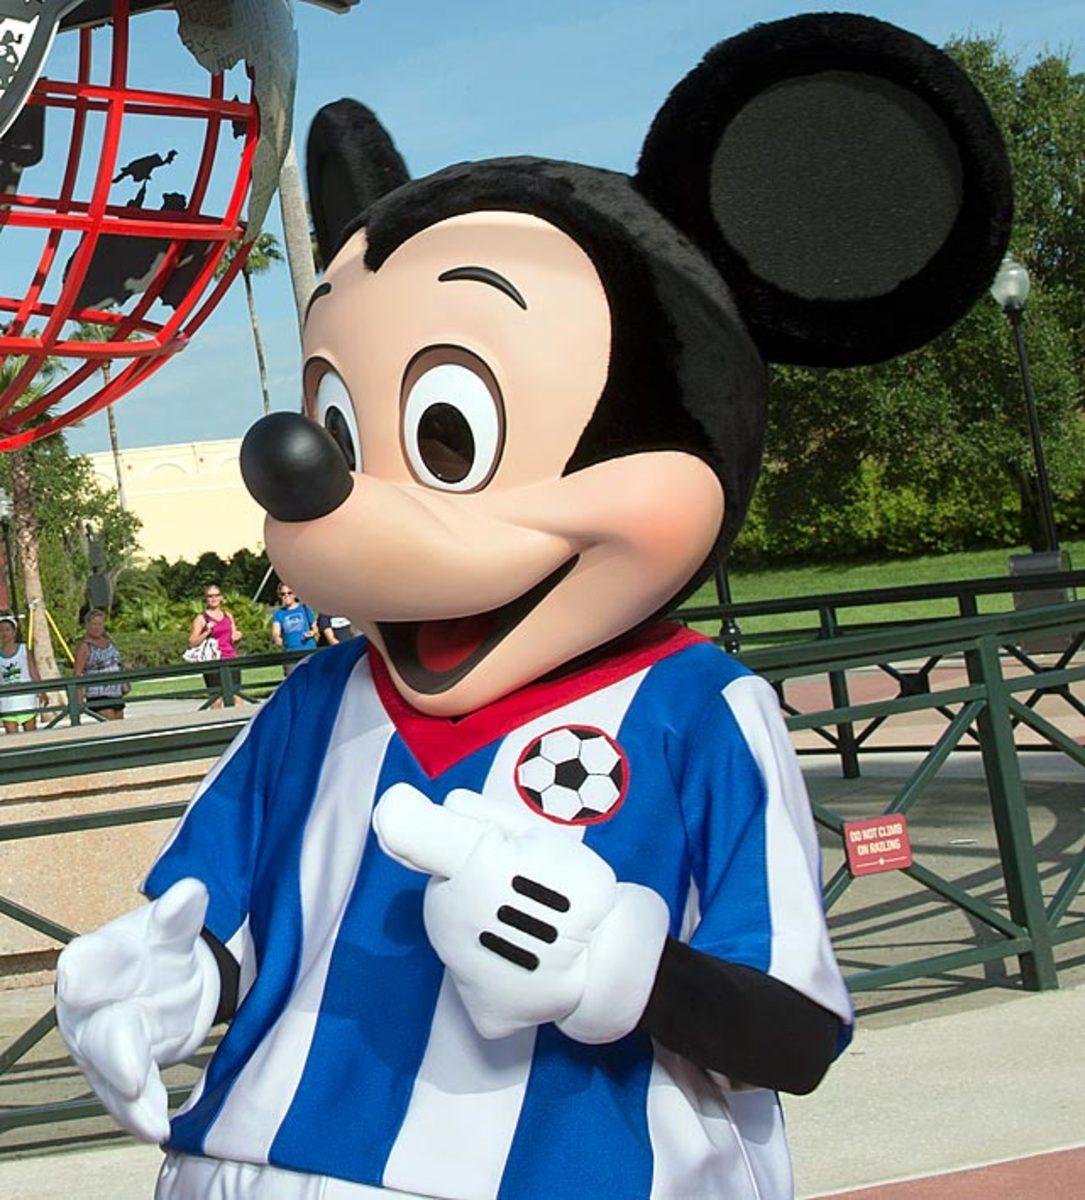 131011163317-080513-disney-world-mickey-mouse-single-image-cut.jpg